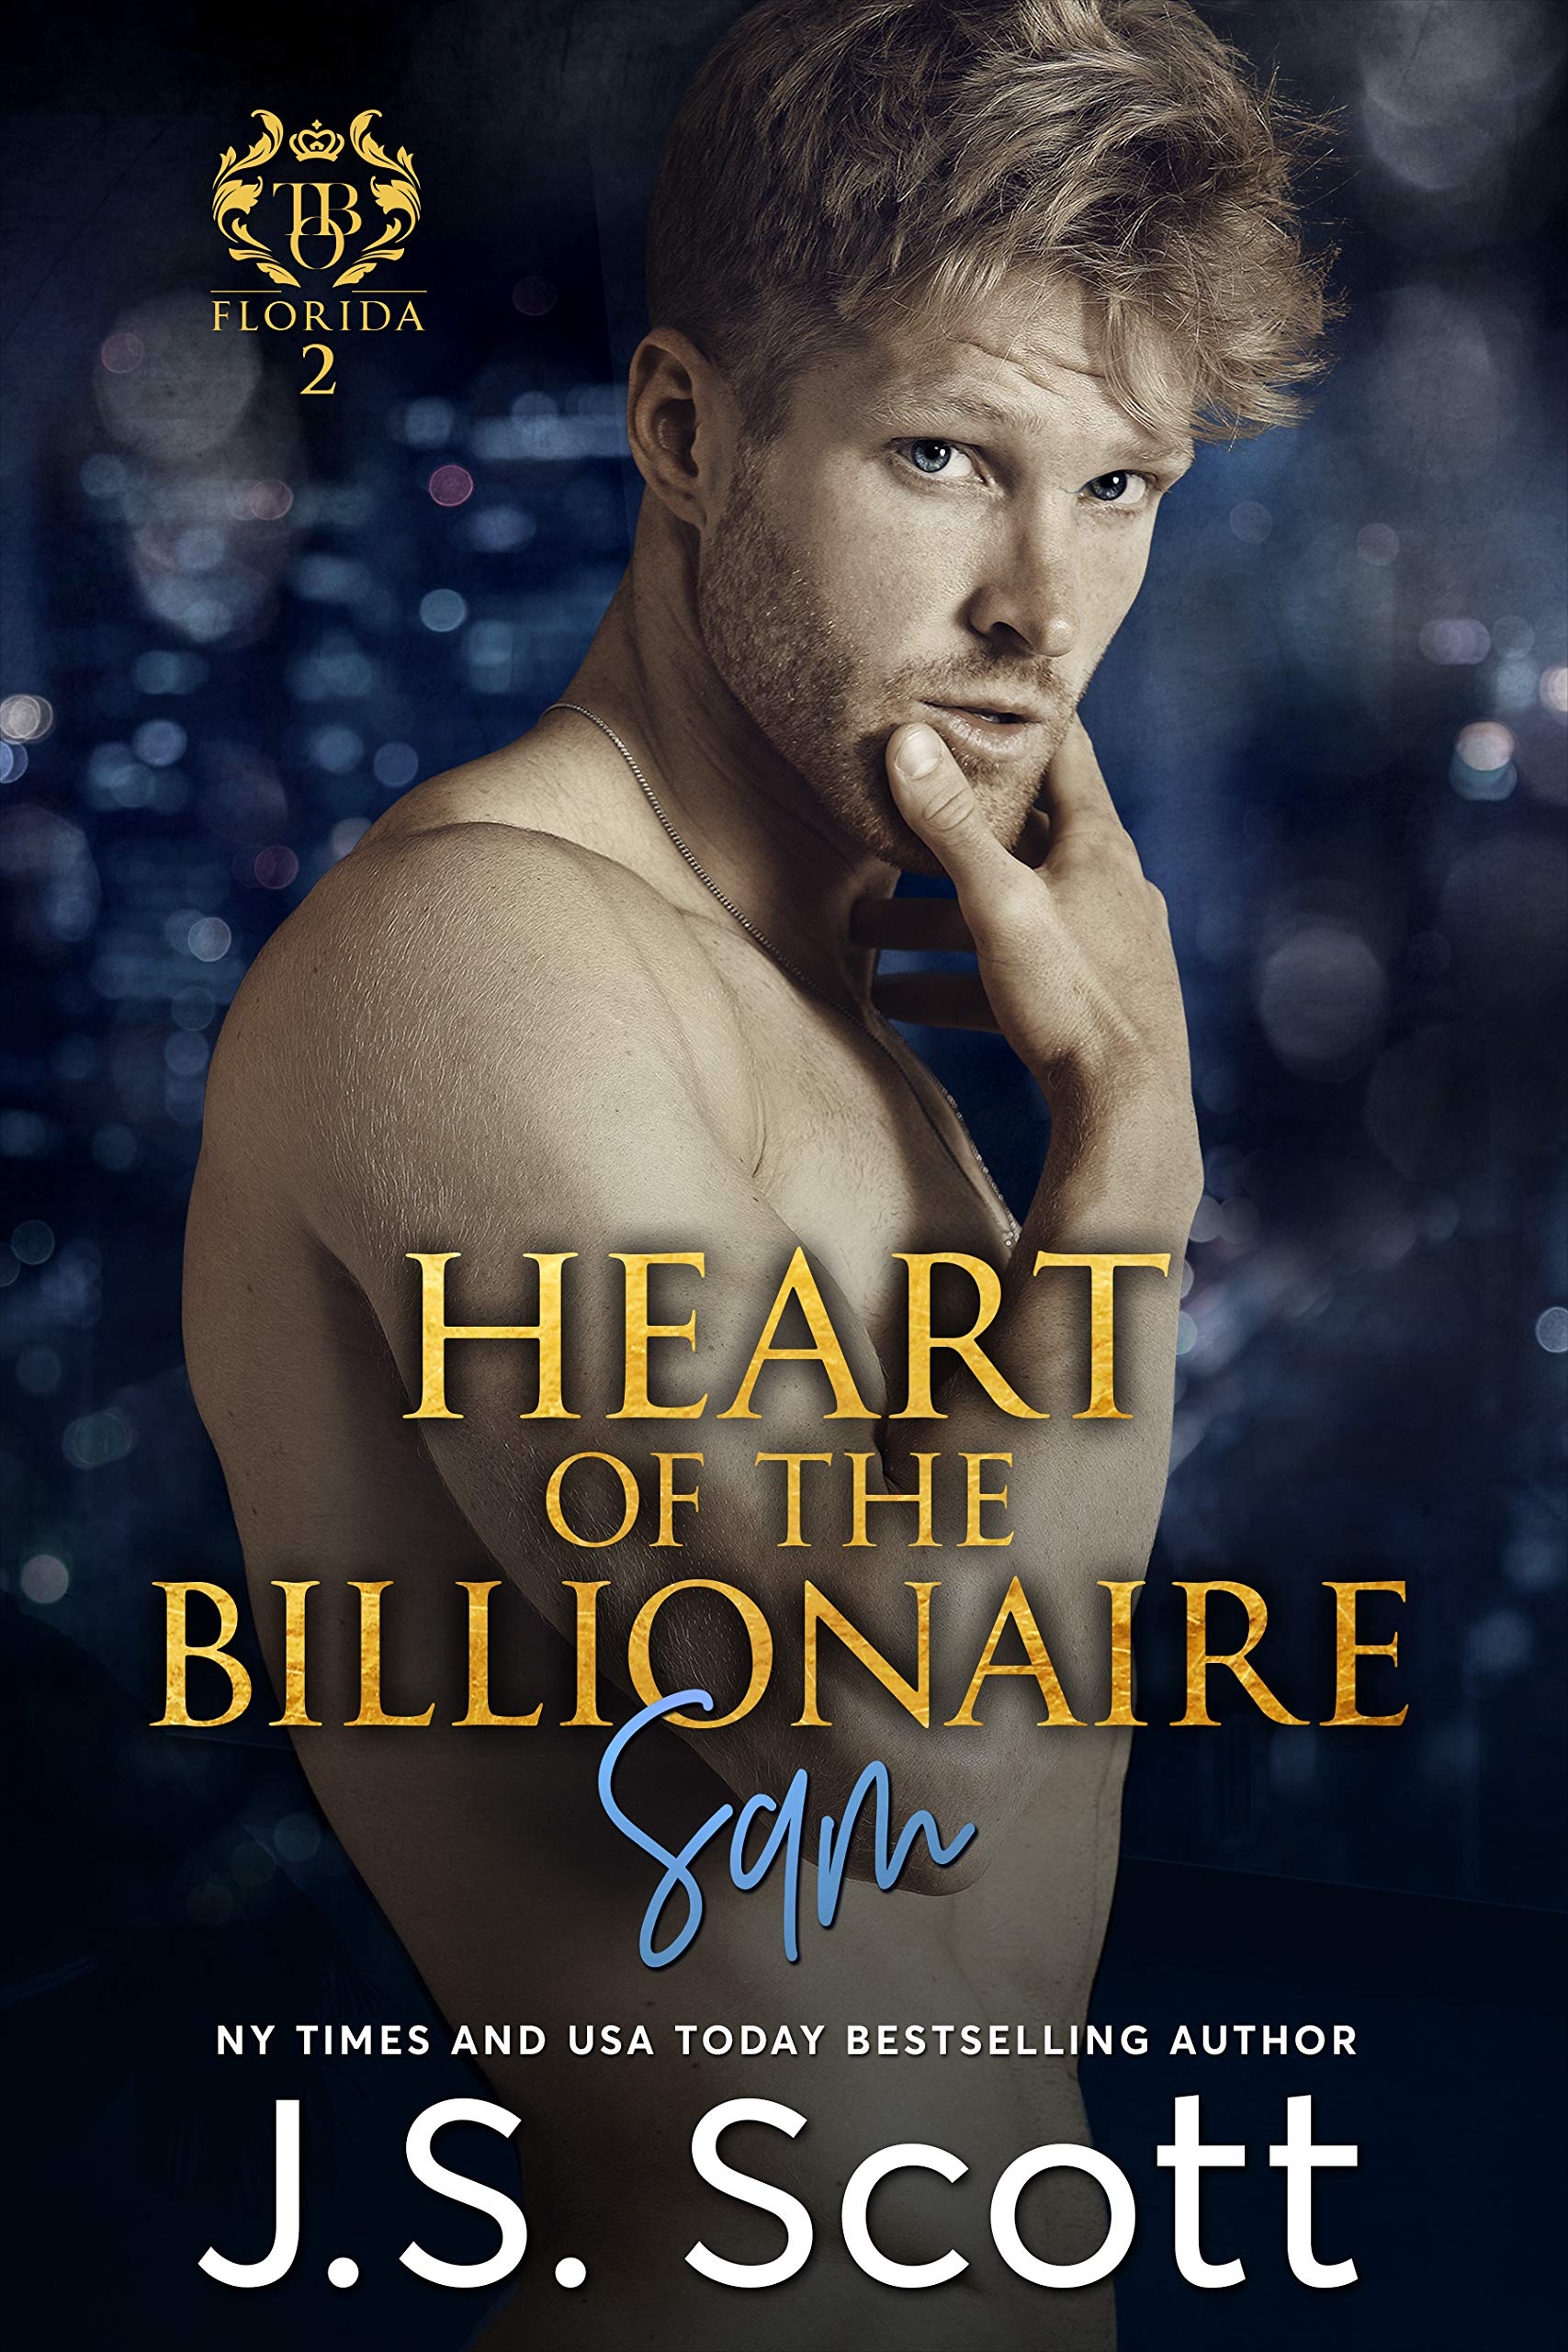 Heart Of The Billionaire (The Billionaire's Obsession, Book 2)